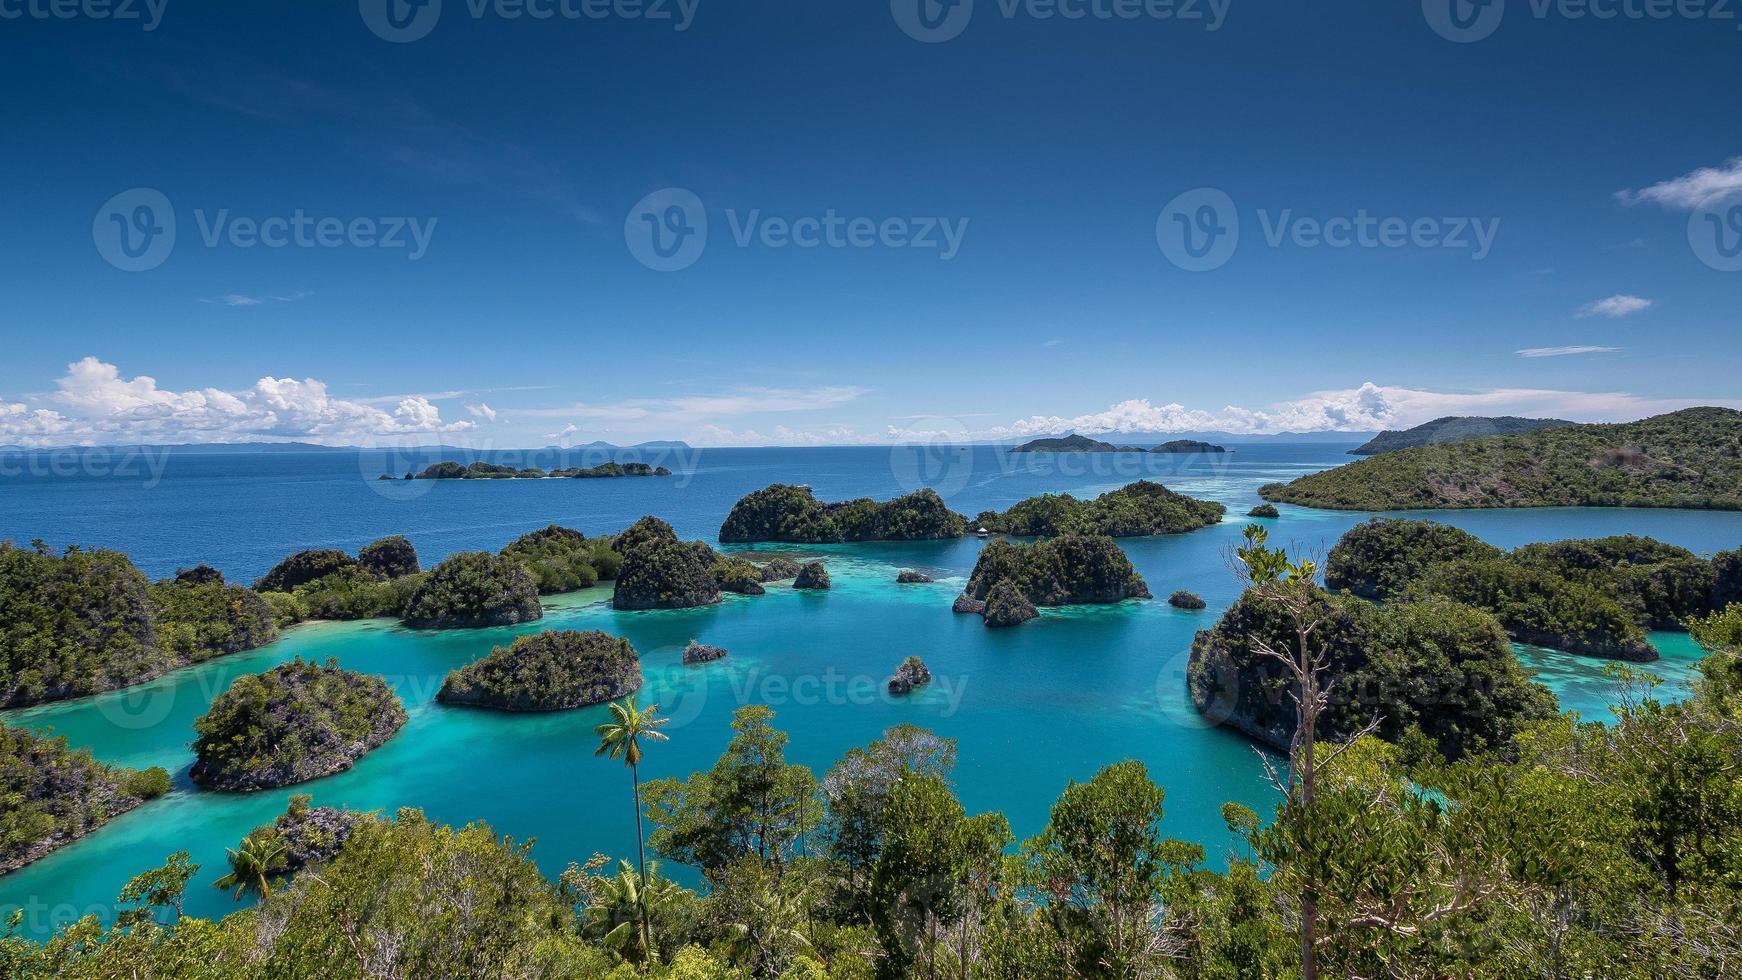 Isla de piedra caliza en la laguna, raja ampat, indonesia 01 foto